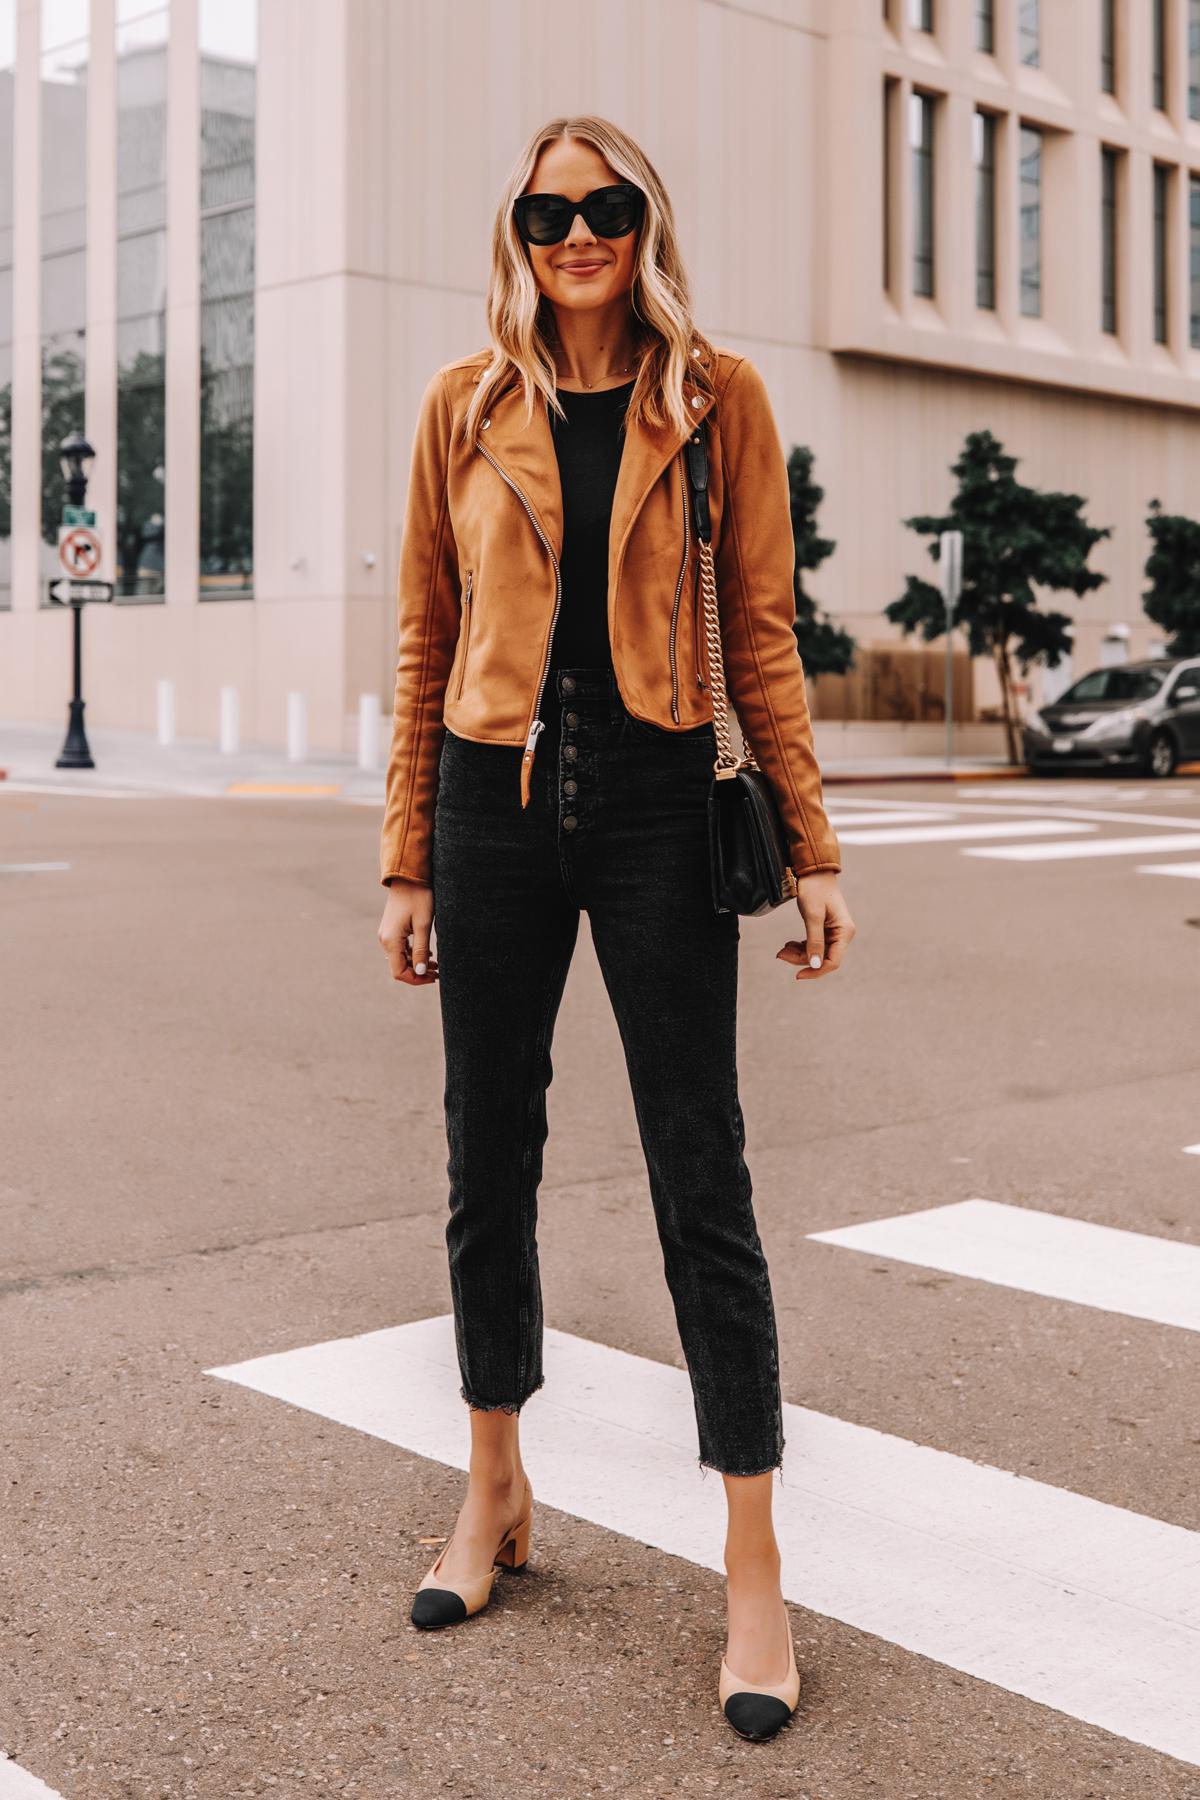 Fashion Jackson Wearing Abercrombie Tan Suede Moto Jacket Black Button Front Jeans Chanel Slingback Shoes 1